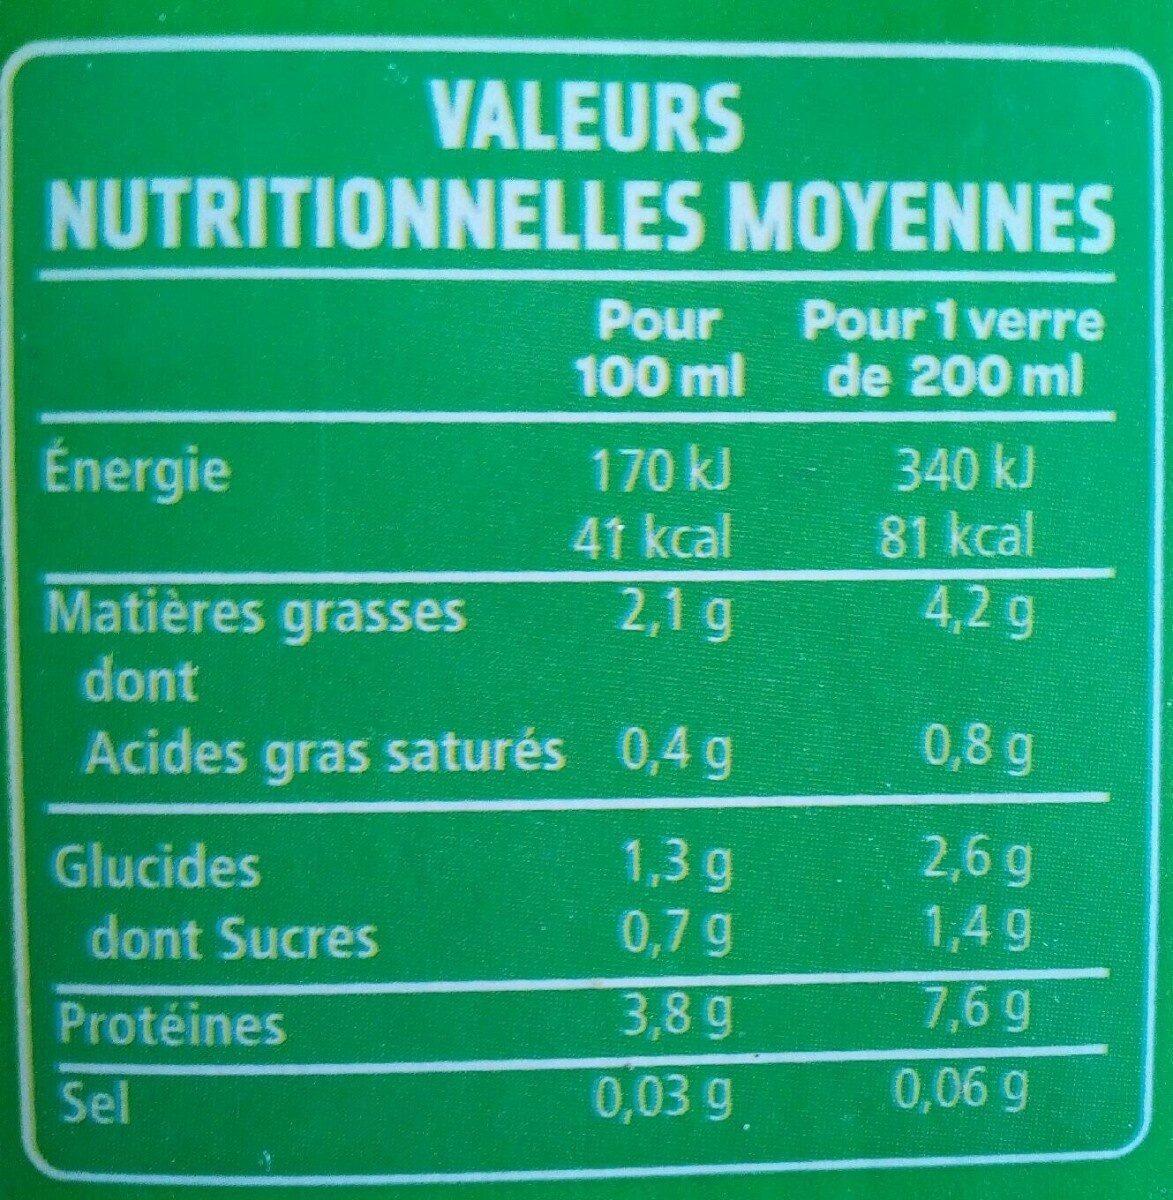 Boisson soja du sud ouest nature - Valori nutrizionali - fr